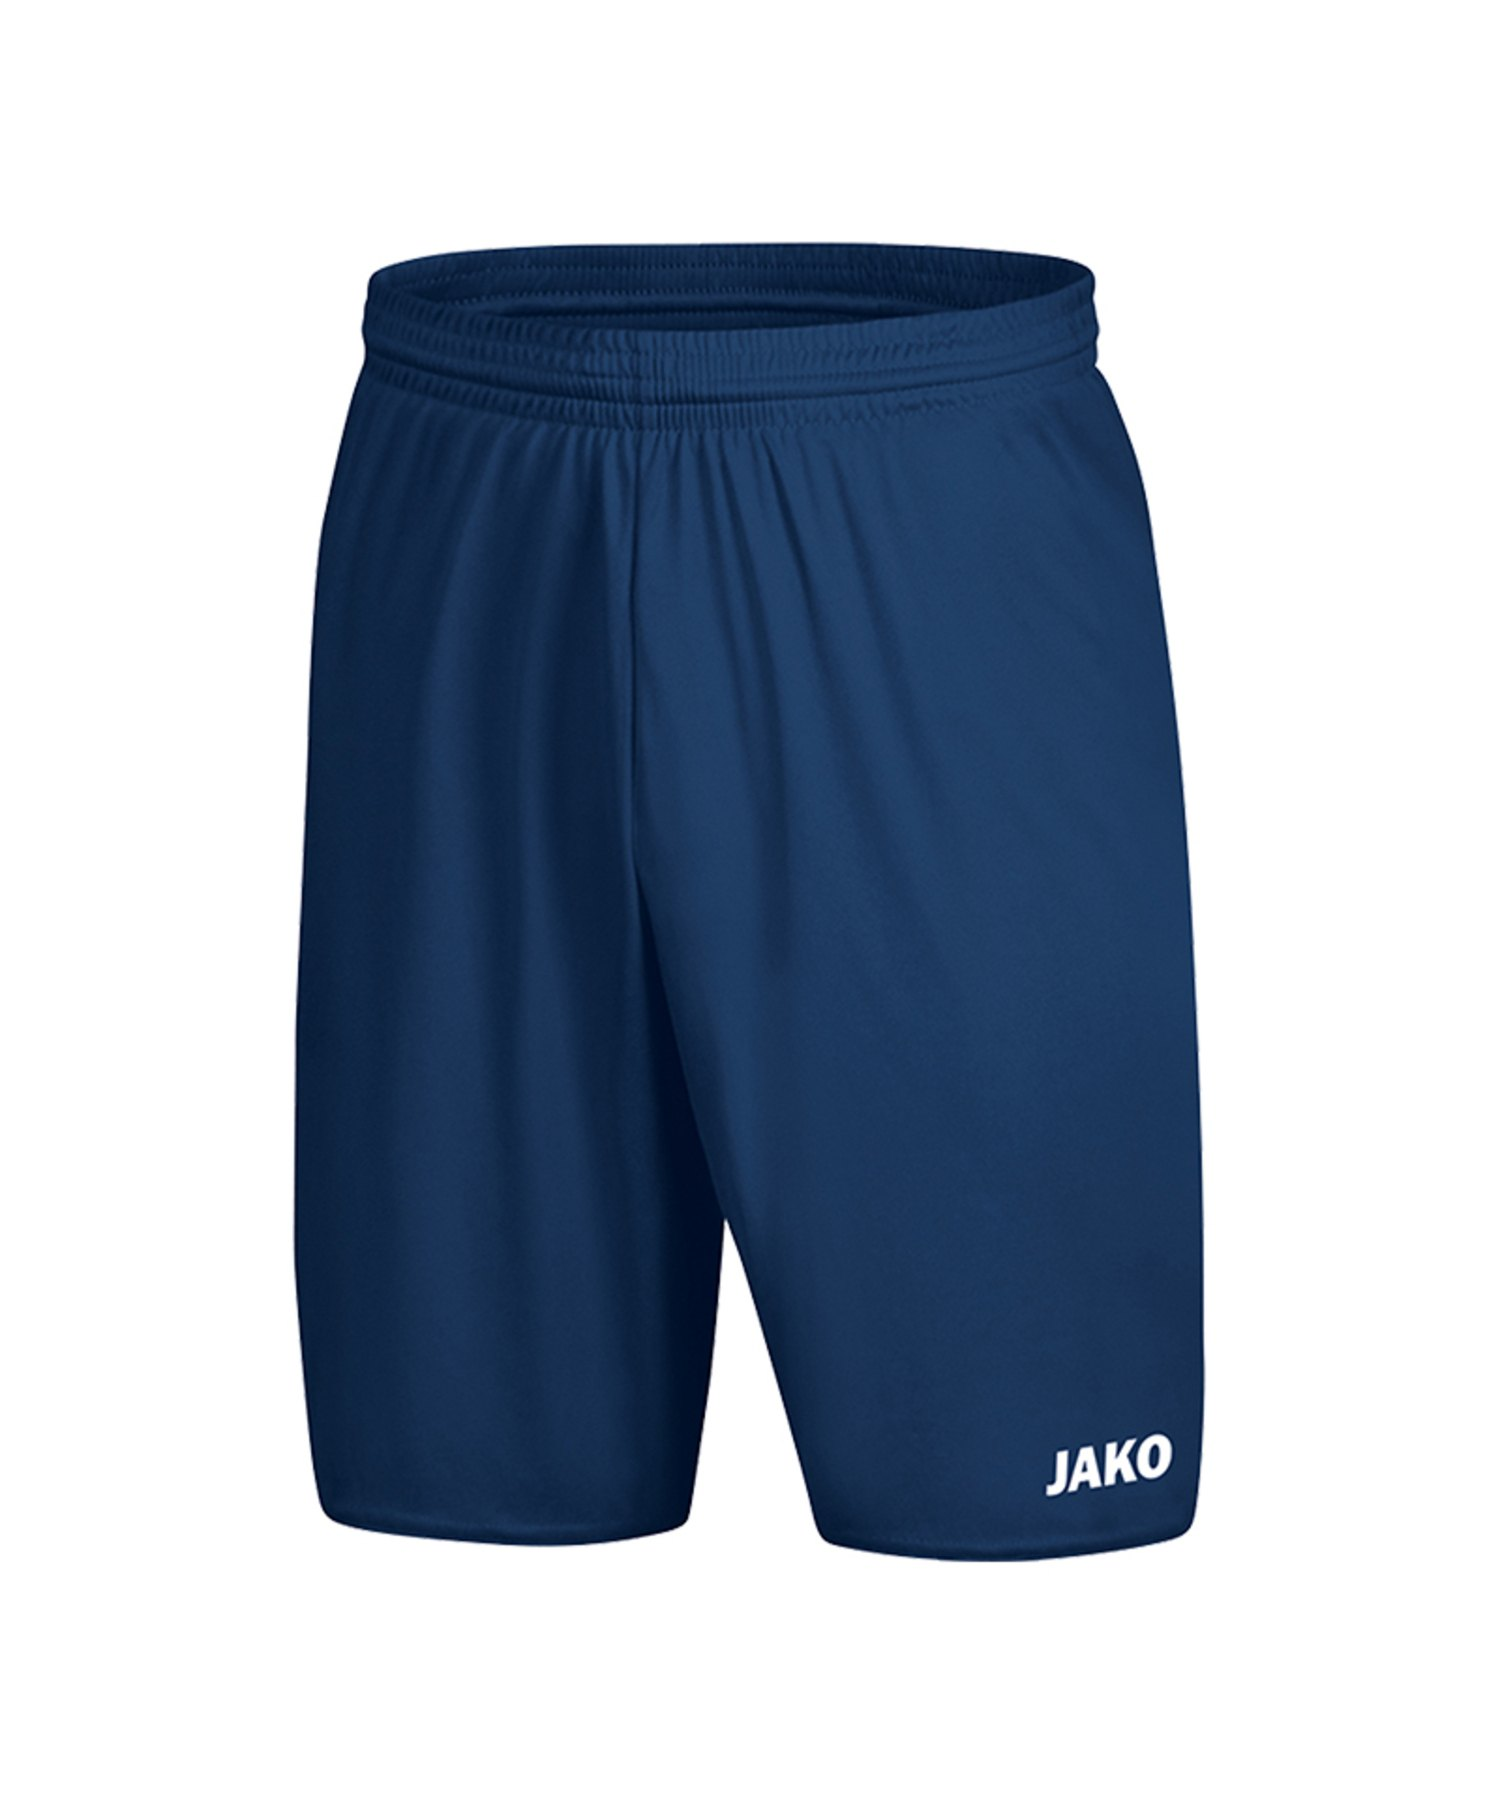 Jako Anderlecht 2.0 Short Hose kurz Blau F09 - Blau